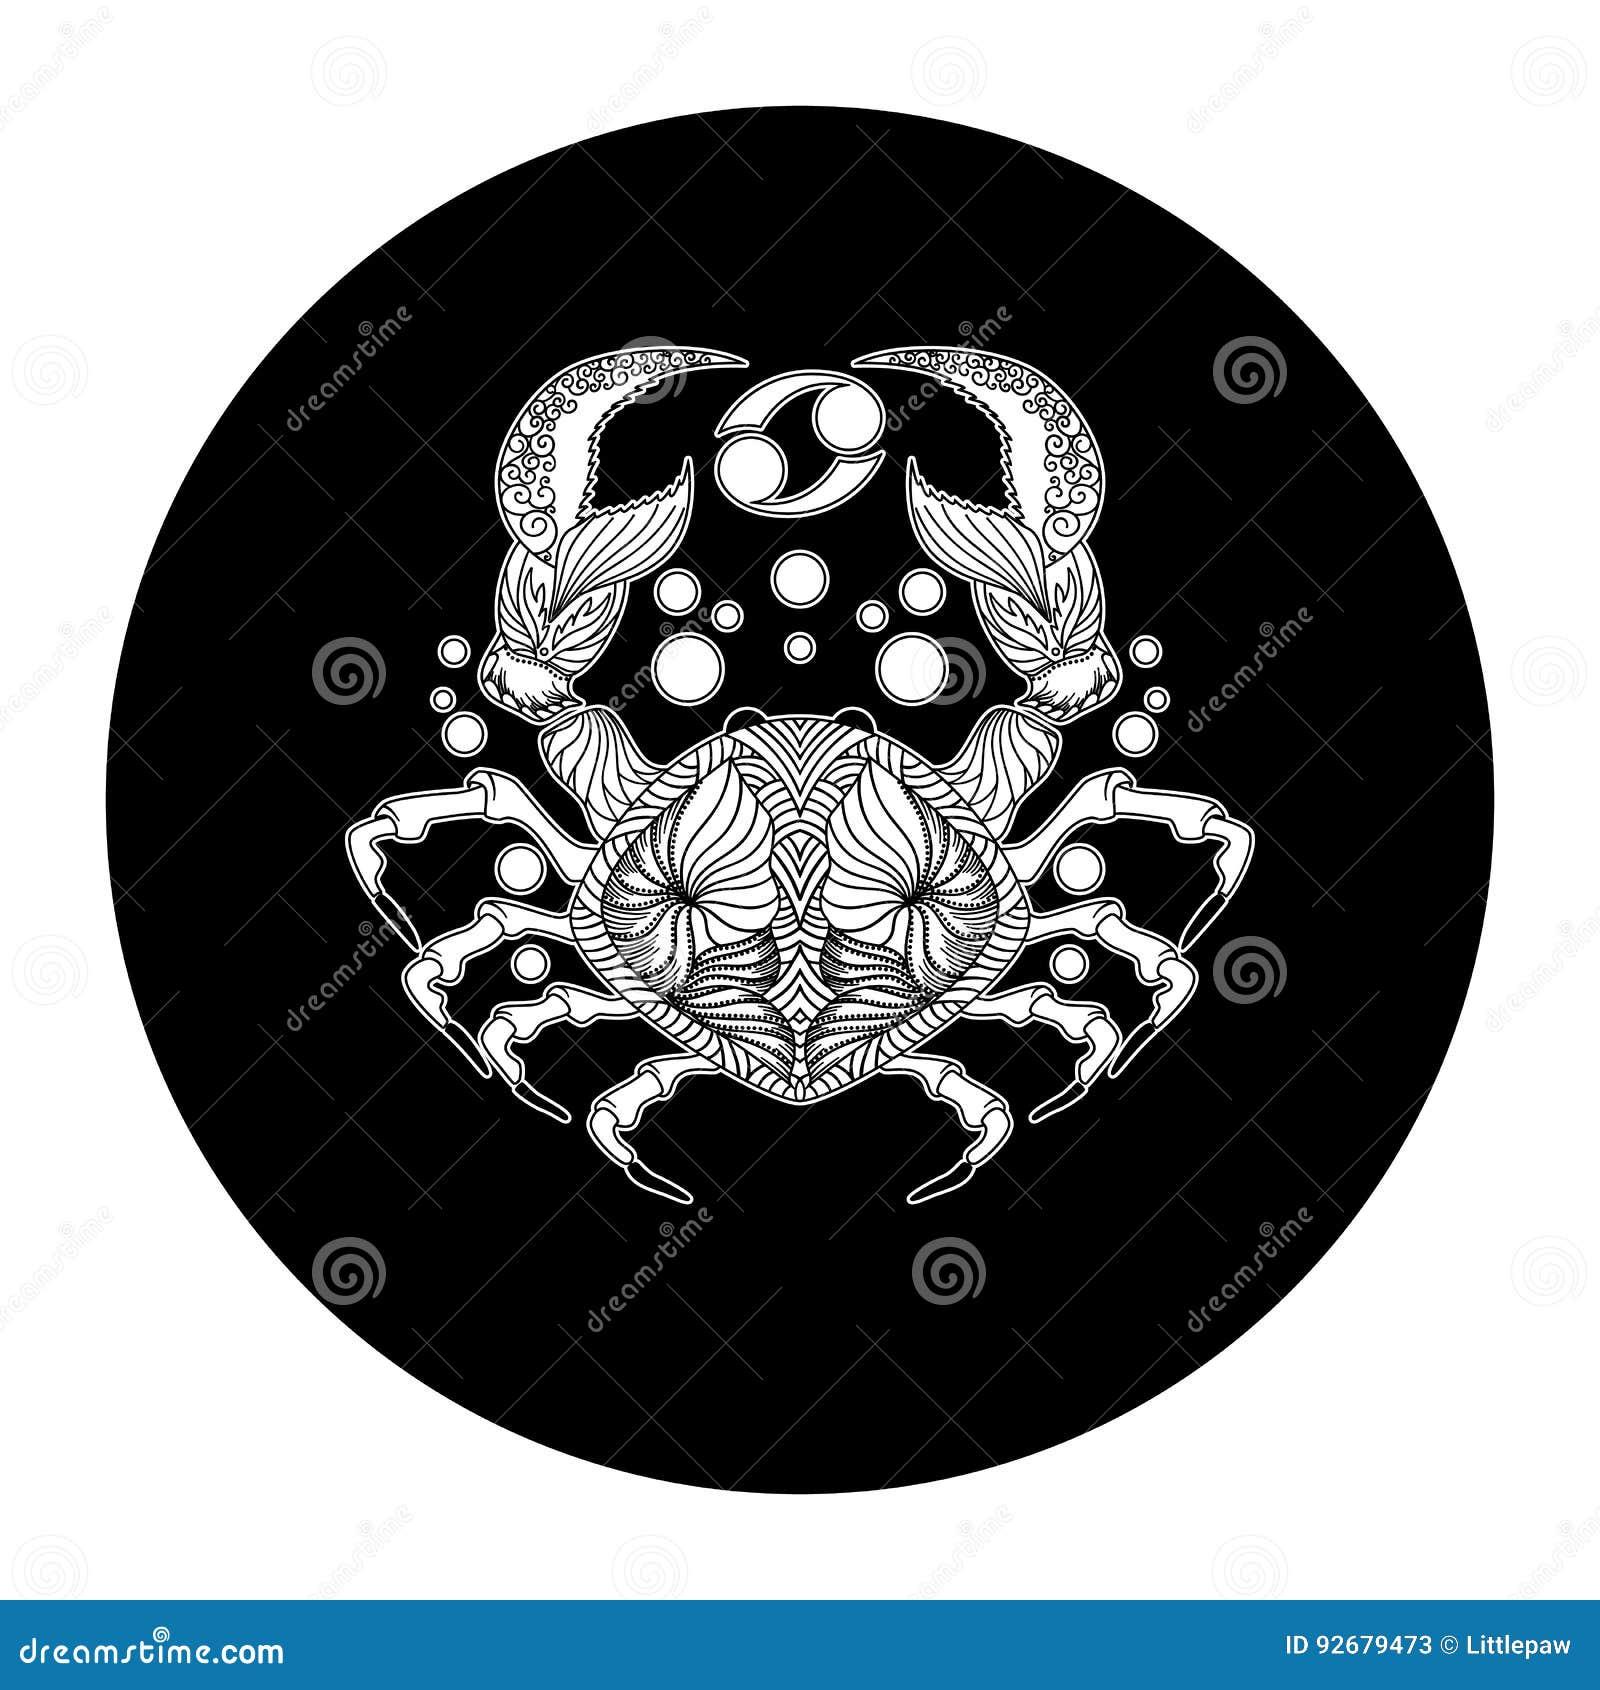 Cancer Zodiac Sign Horoscope Symbol Vector Illustration Stock